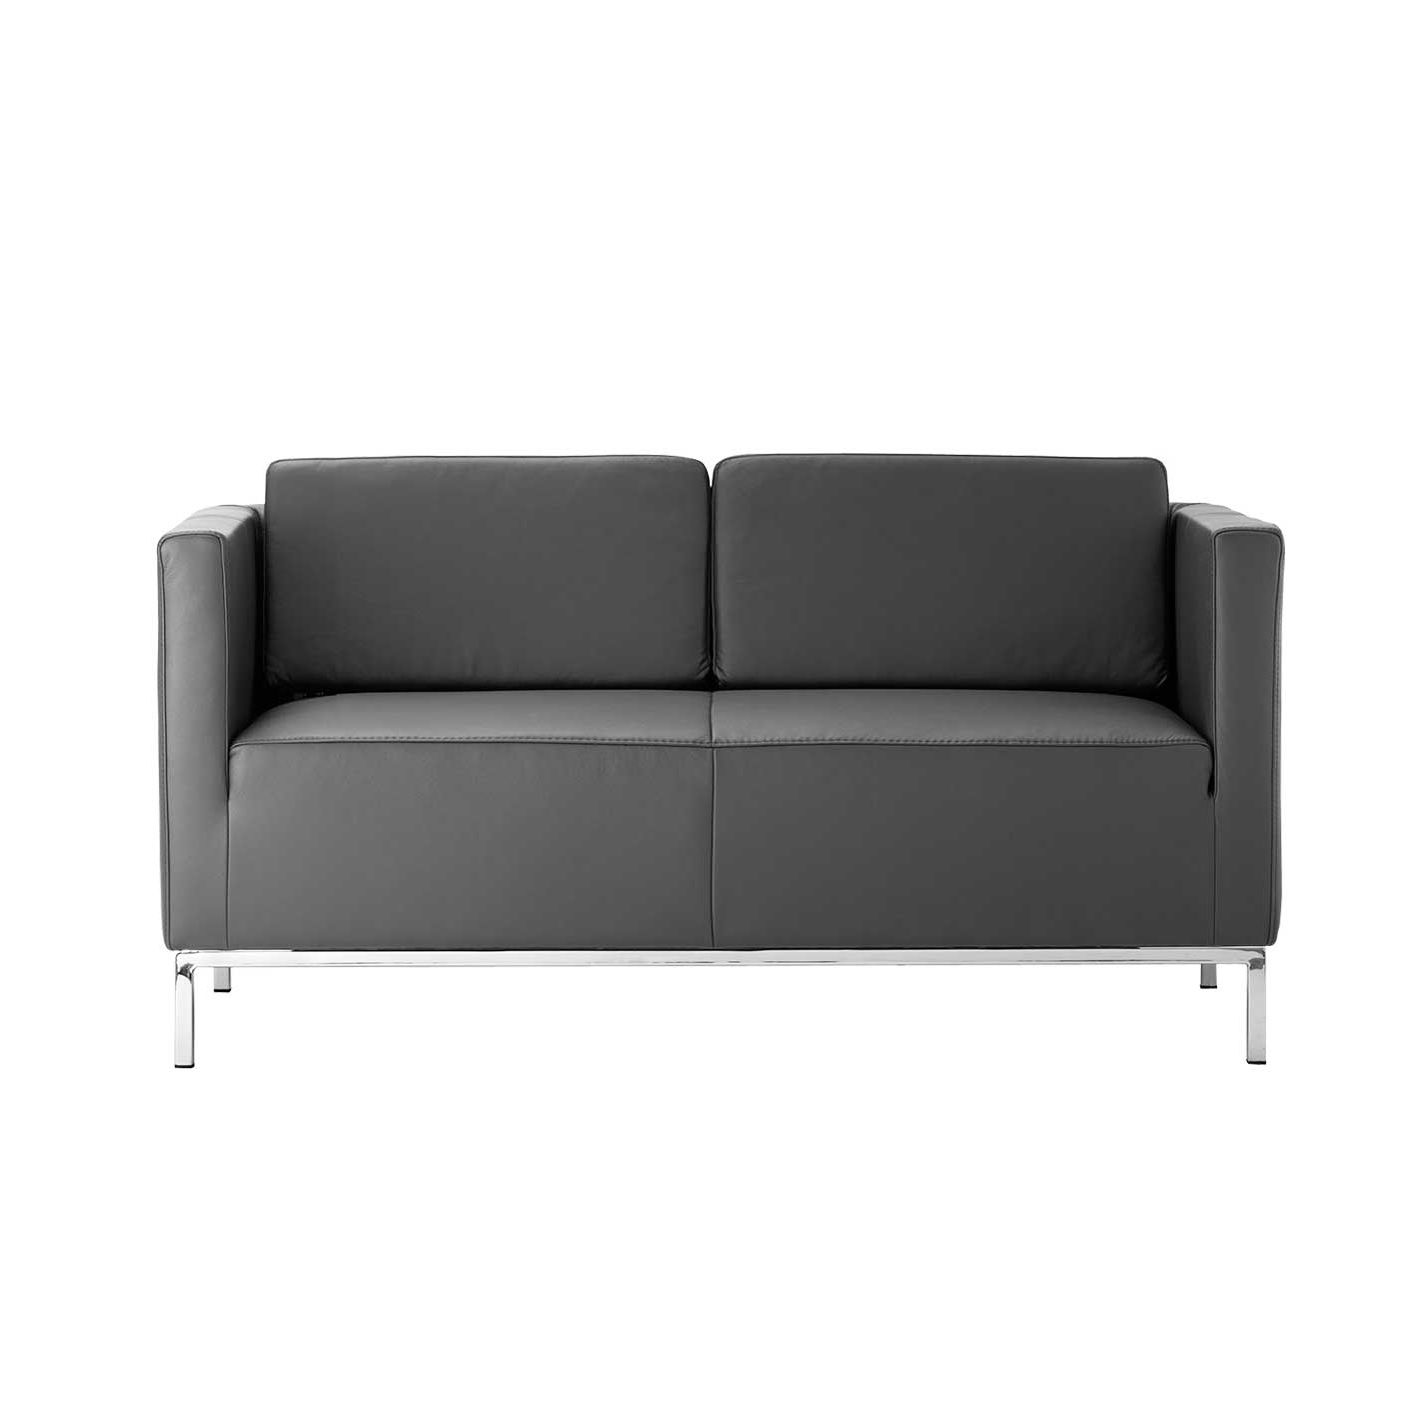 Modernes Sofa / Leder / Stoff / Gewerbe - ULTIMO - rosconi